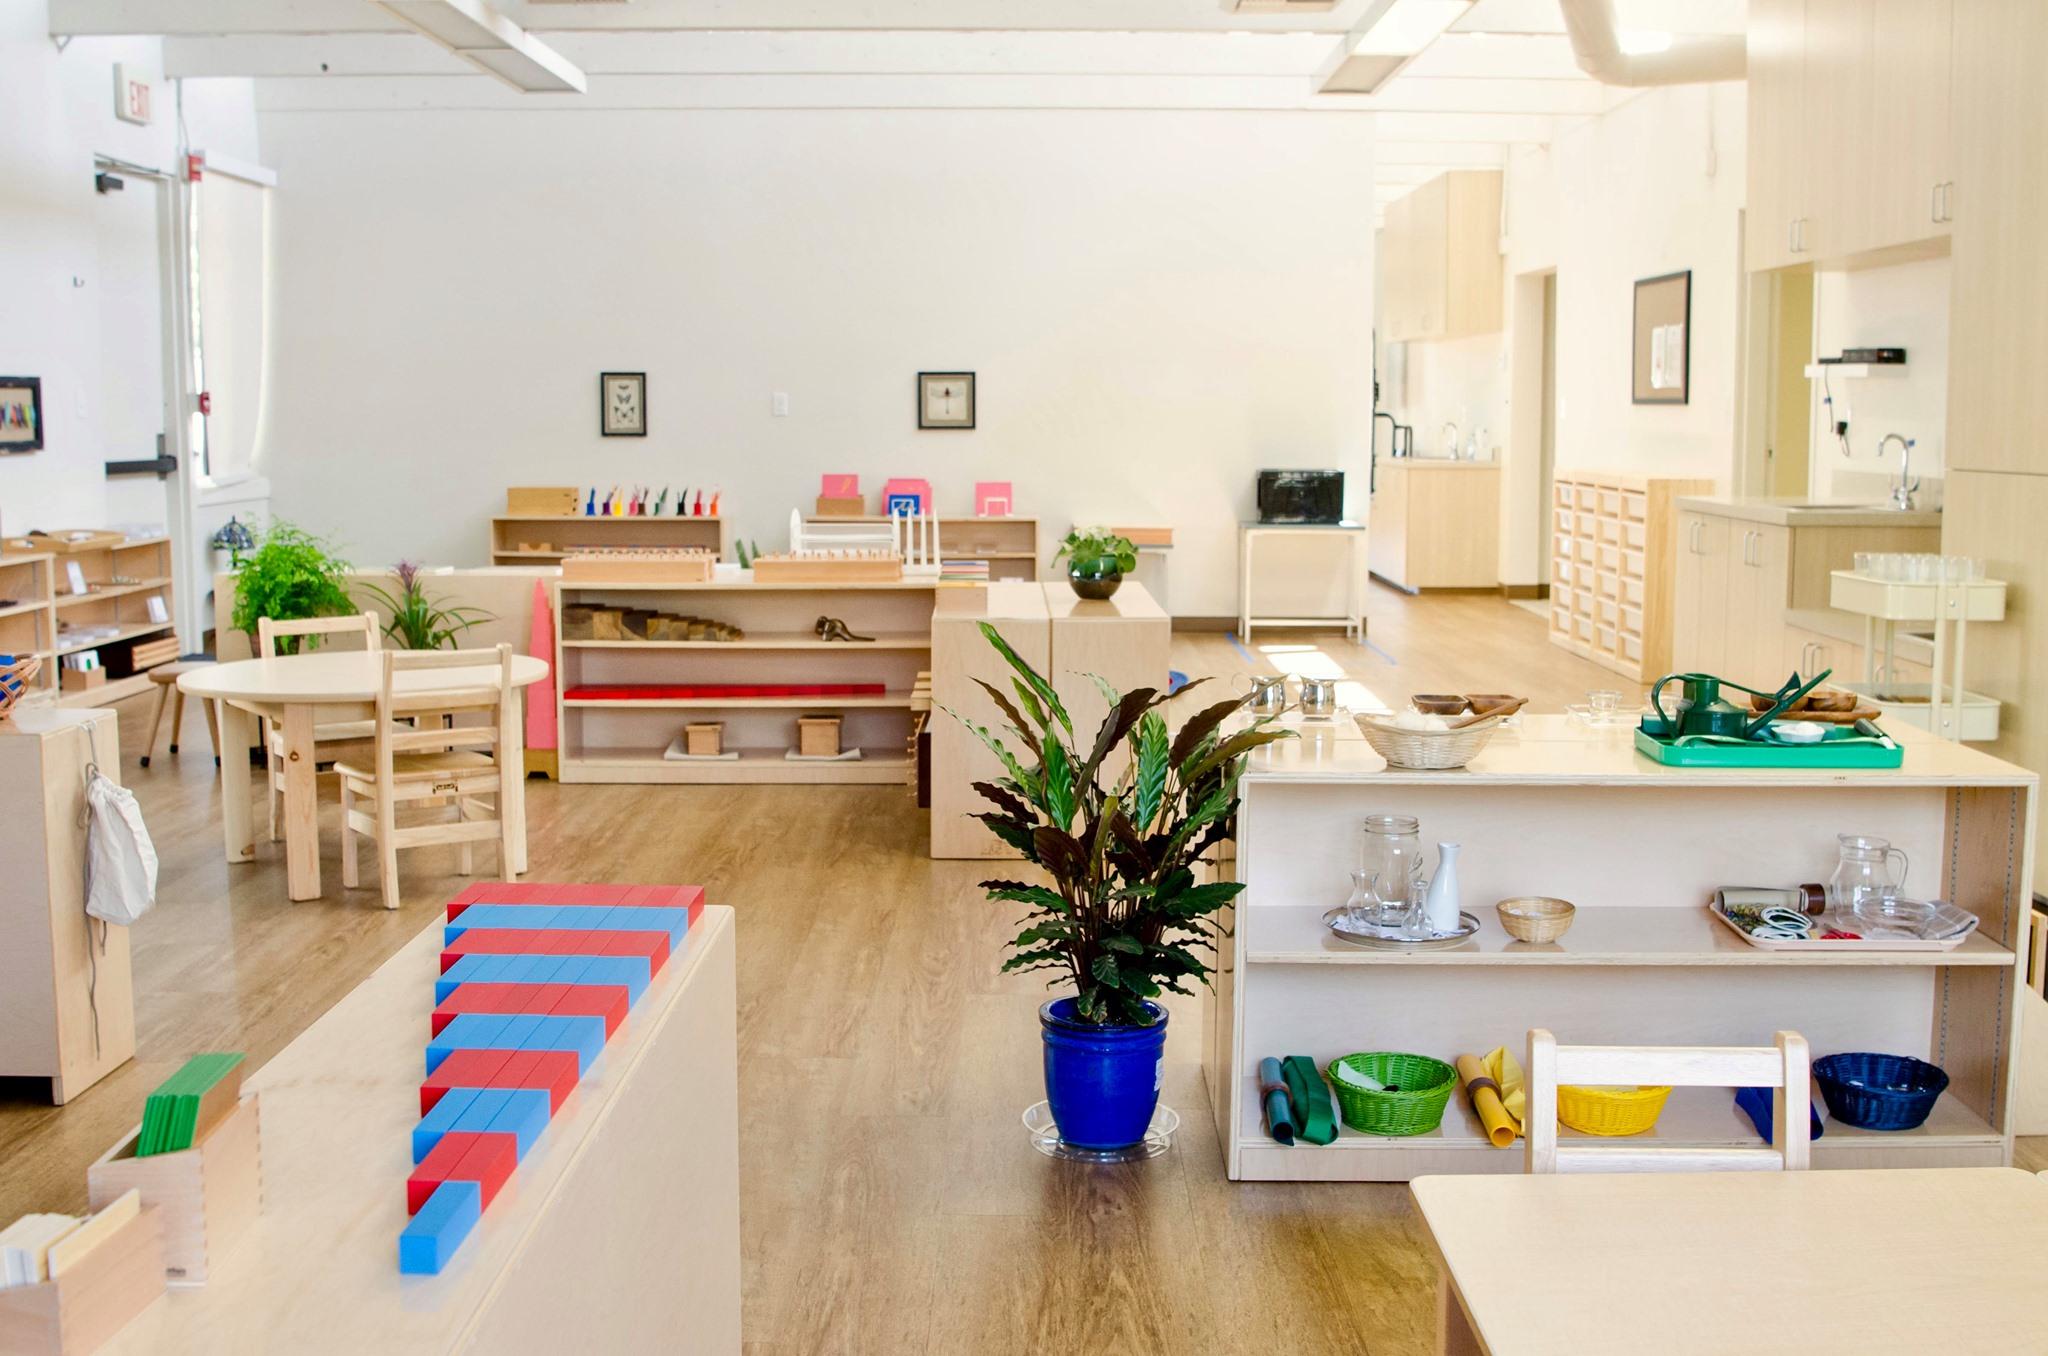 NEWS - Guidepost Montessori Opens New Campus at Longmont